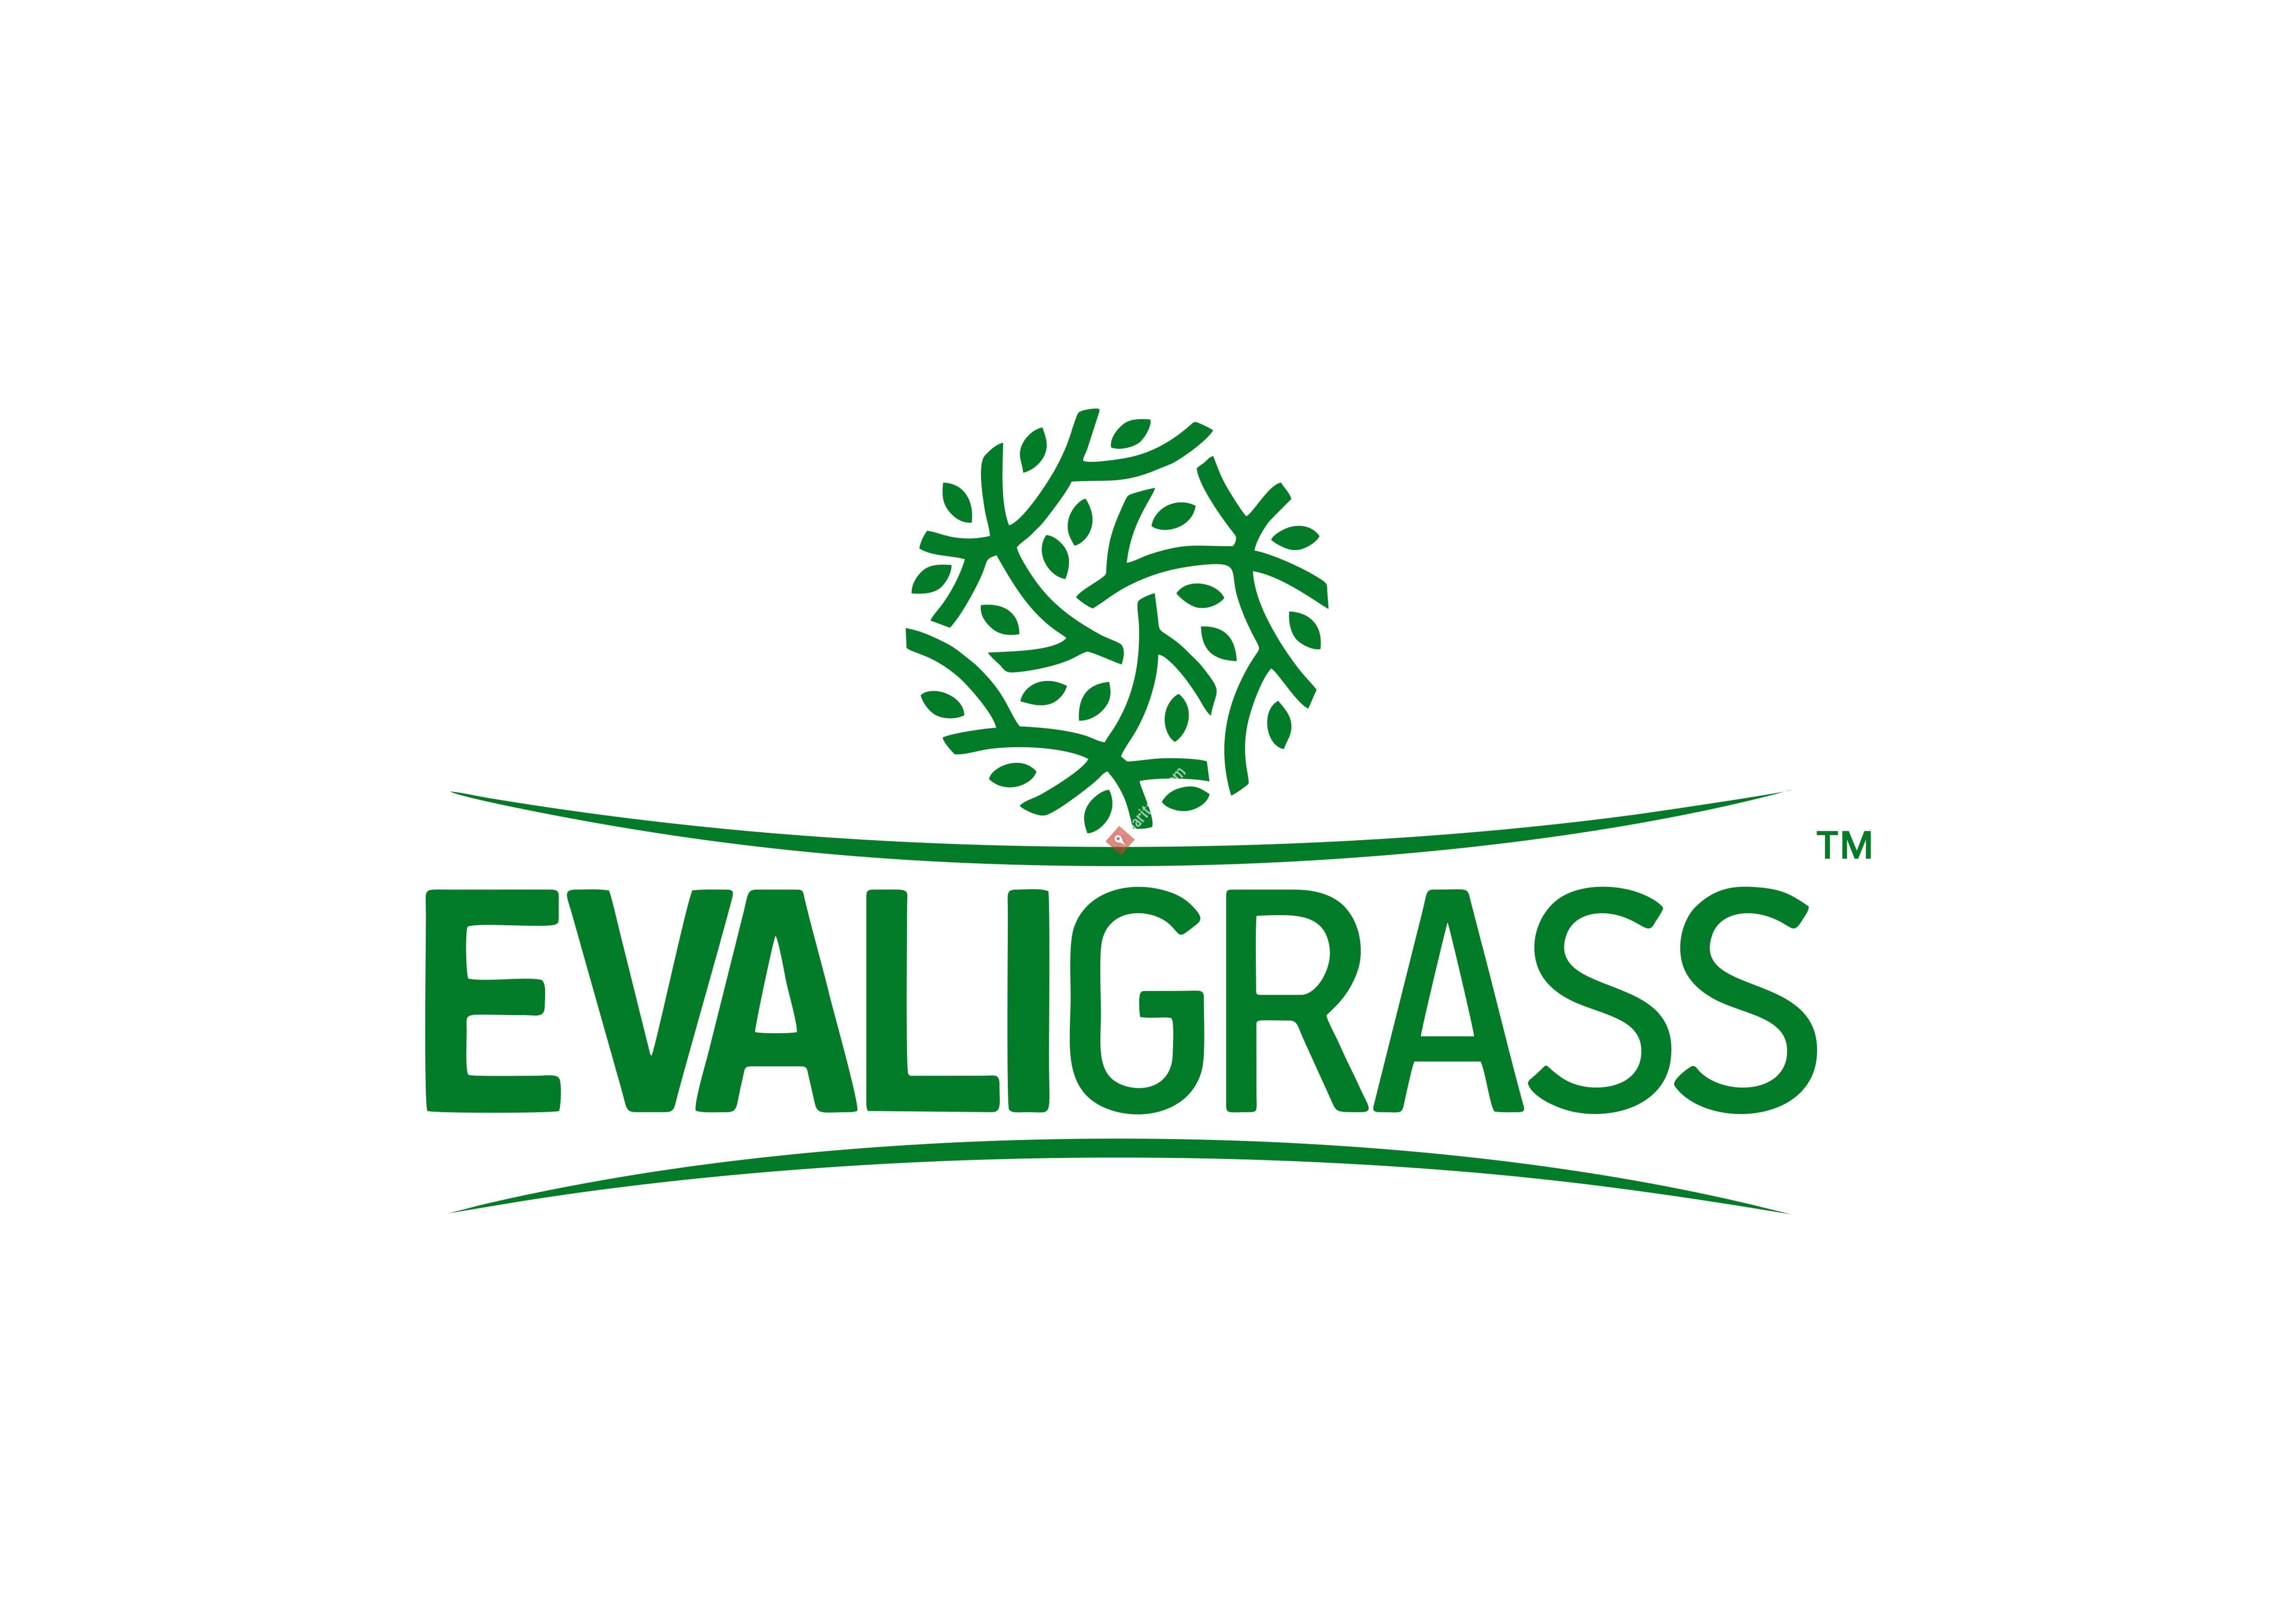 Evaligrass – Grass Fence Manufacturer